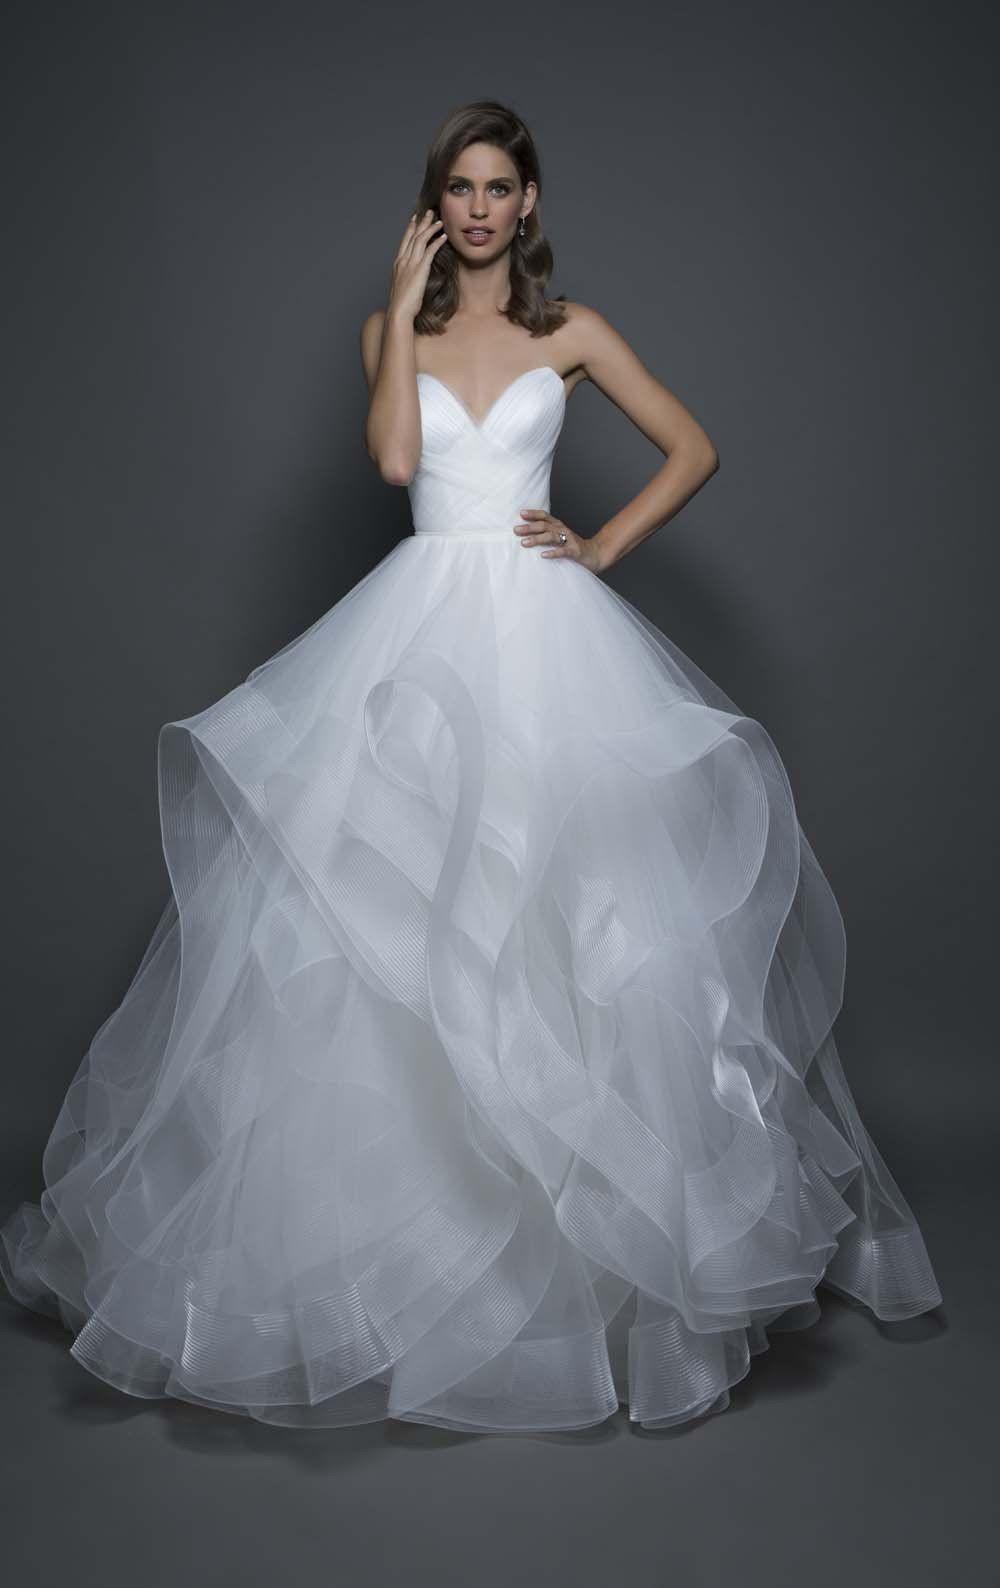 Panina Tornai Wedding Gowns Luxury Pnina Ball Gown Wedding Dresses Fashion Dresses Pnina Tornai Wedding Dress Ball Gown Wedding Dress Wedding Dresses